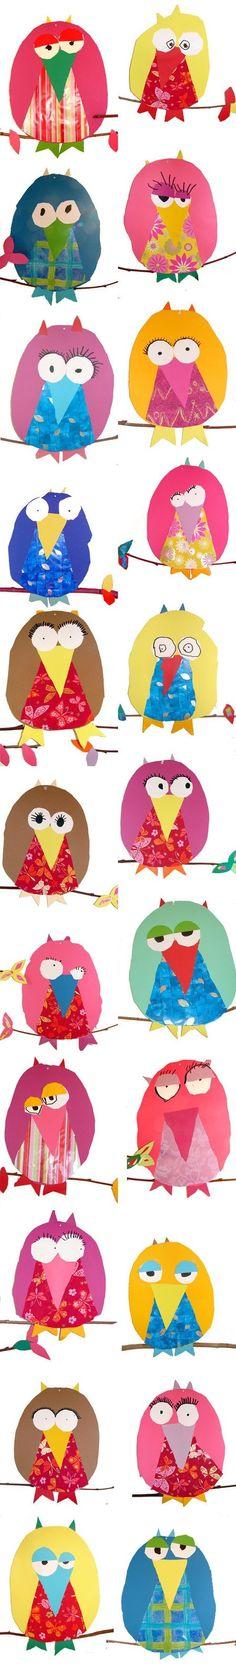 cute birdies by esmeralda